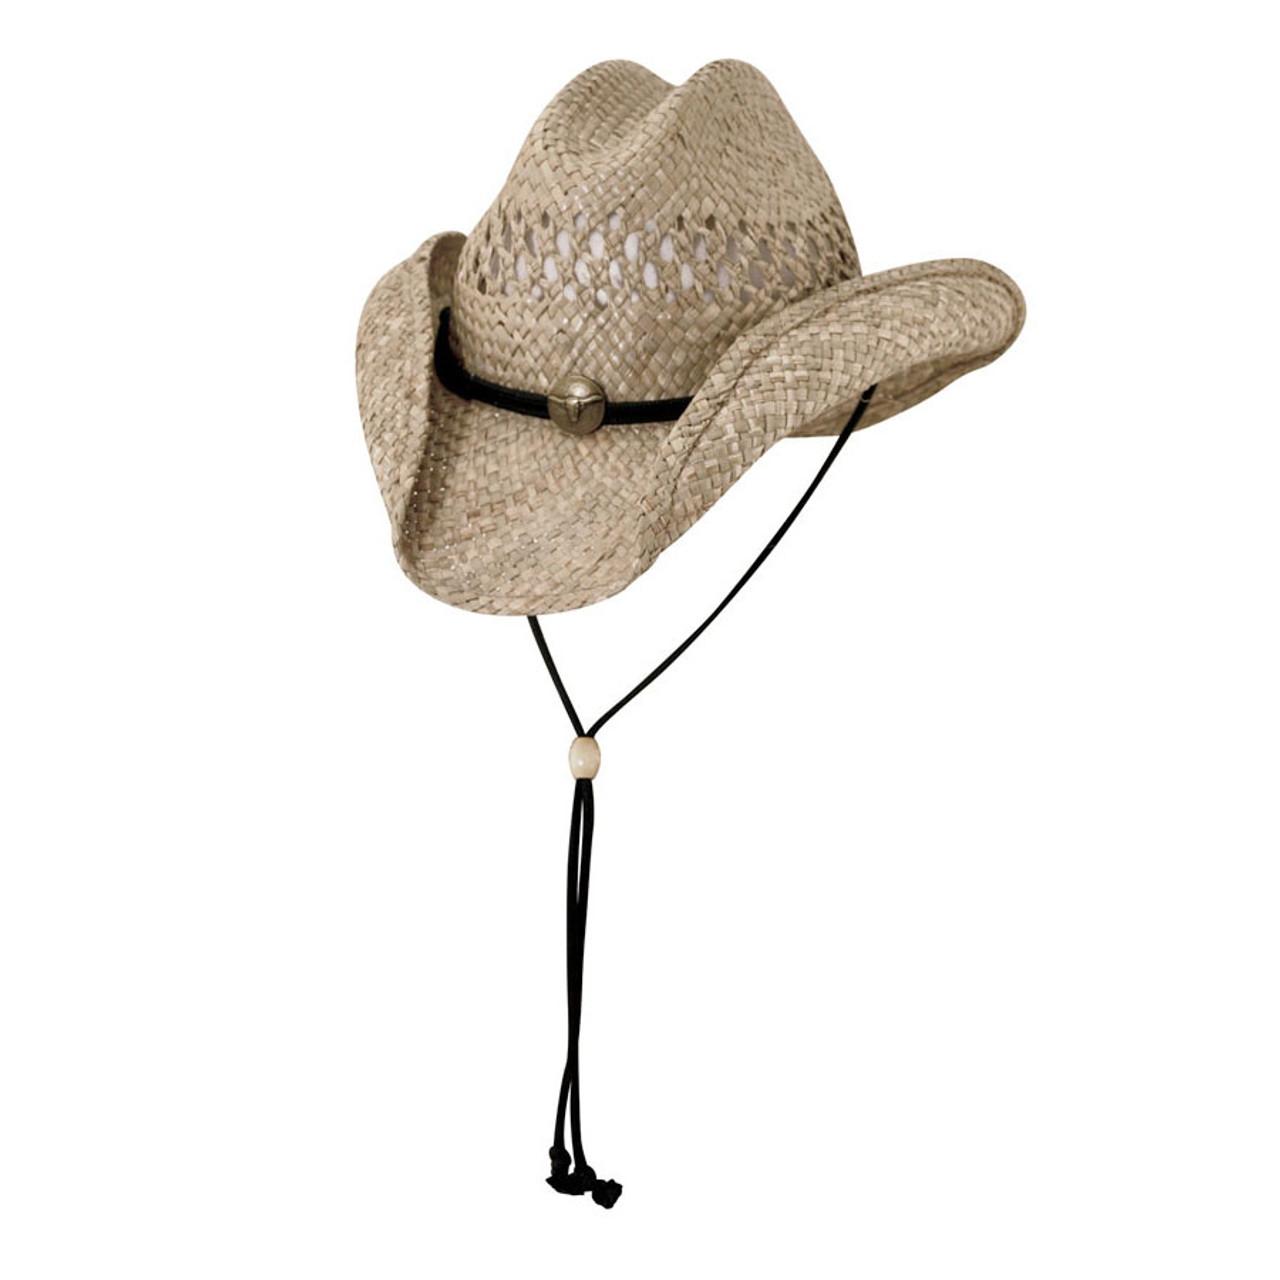 6b3b6da3 Scala | Seagrass Cowboy Hat | Hats Unlimited